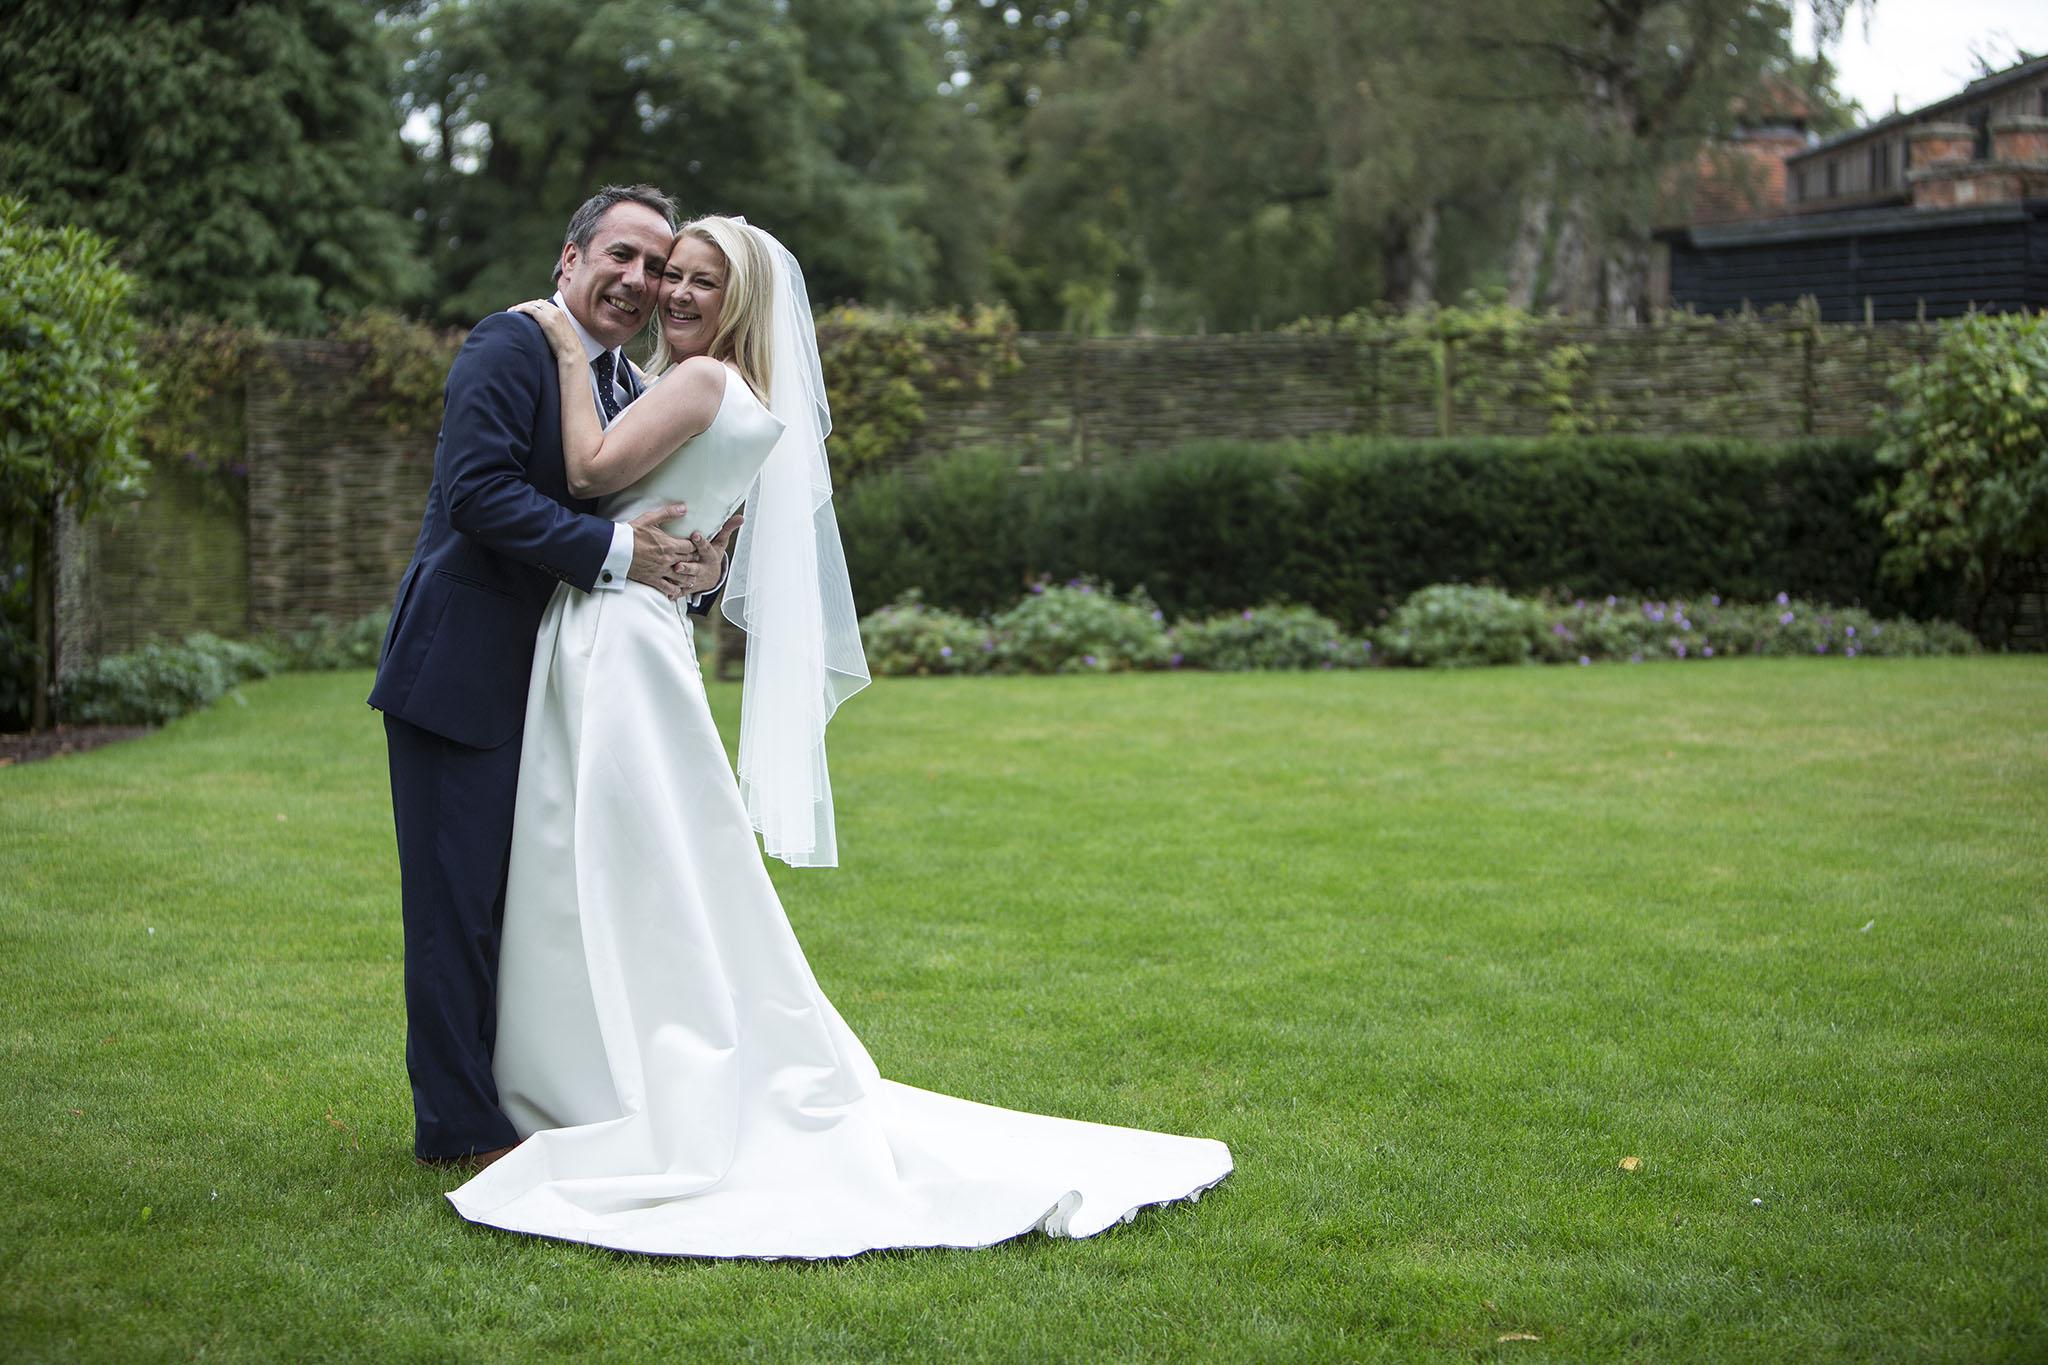 elizabethg_photography_hertfordshire_fineart_photographer_tonycharlie_wedding_photography_aldermaston_wasing_park_reading_37.jpg